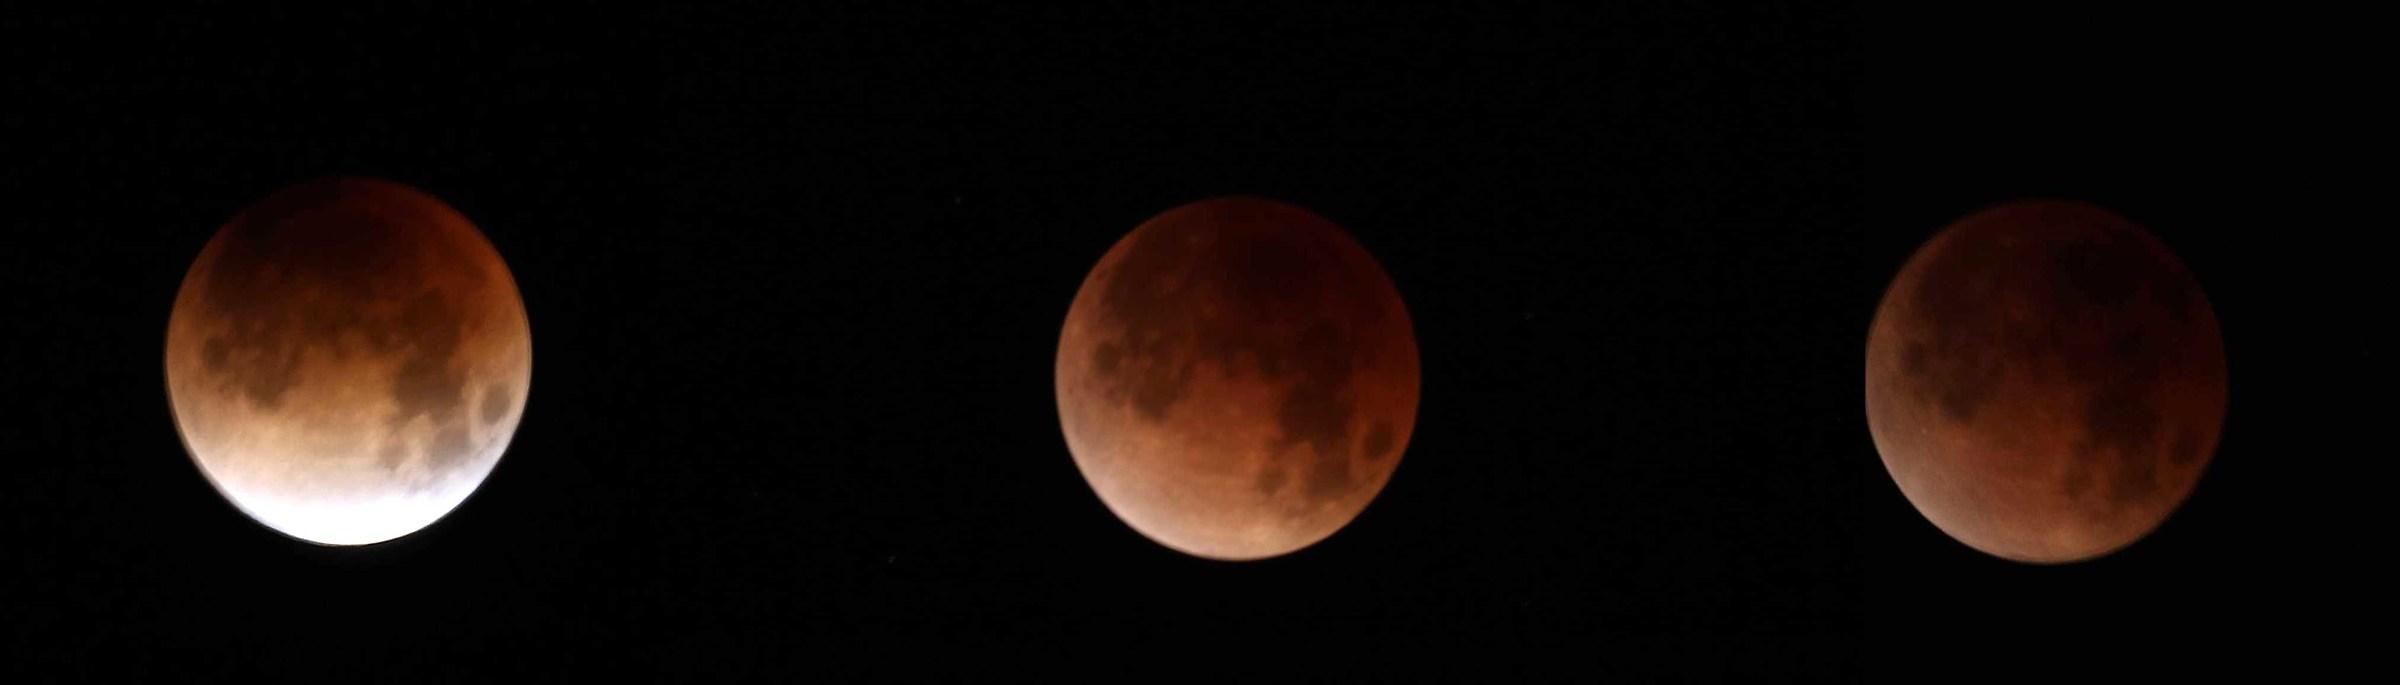 luna piena luna piena eclissi lunare, 31/01/2018...